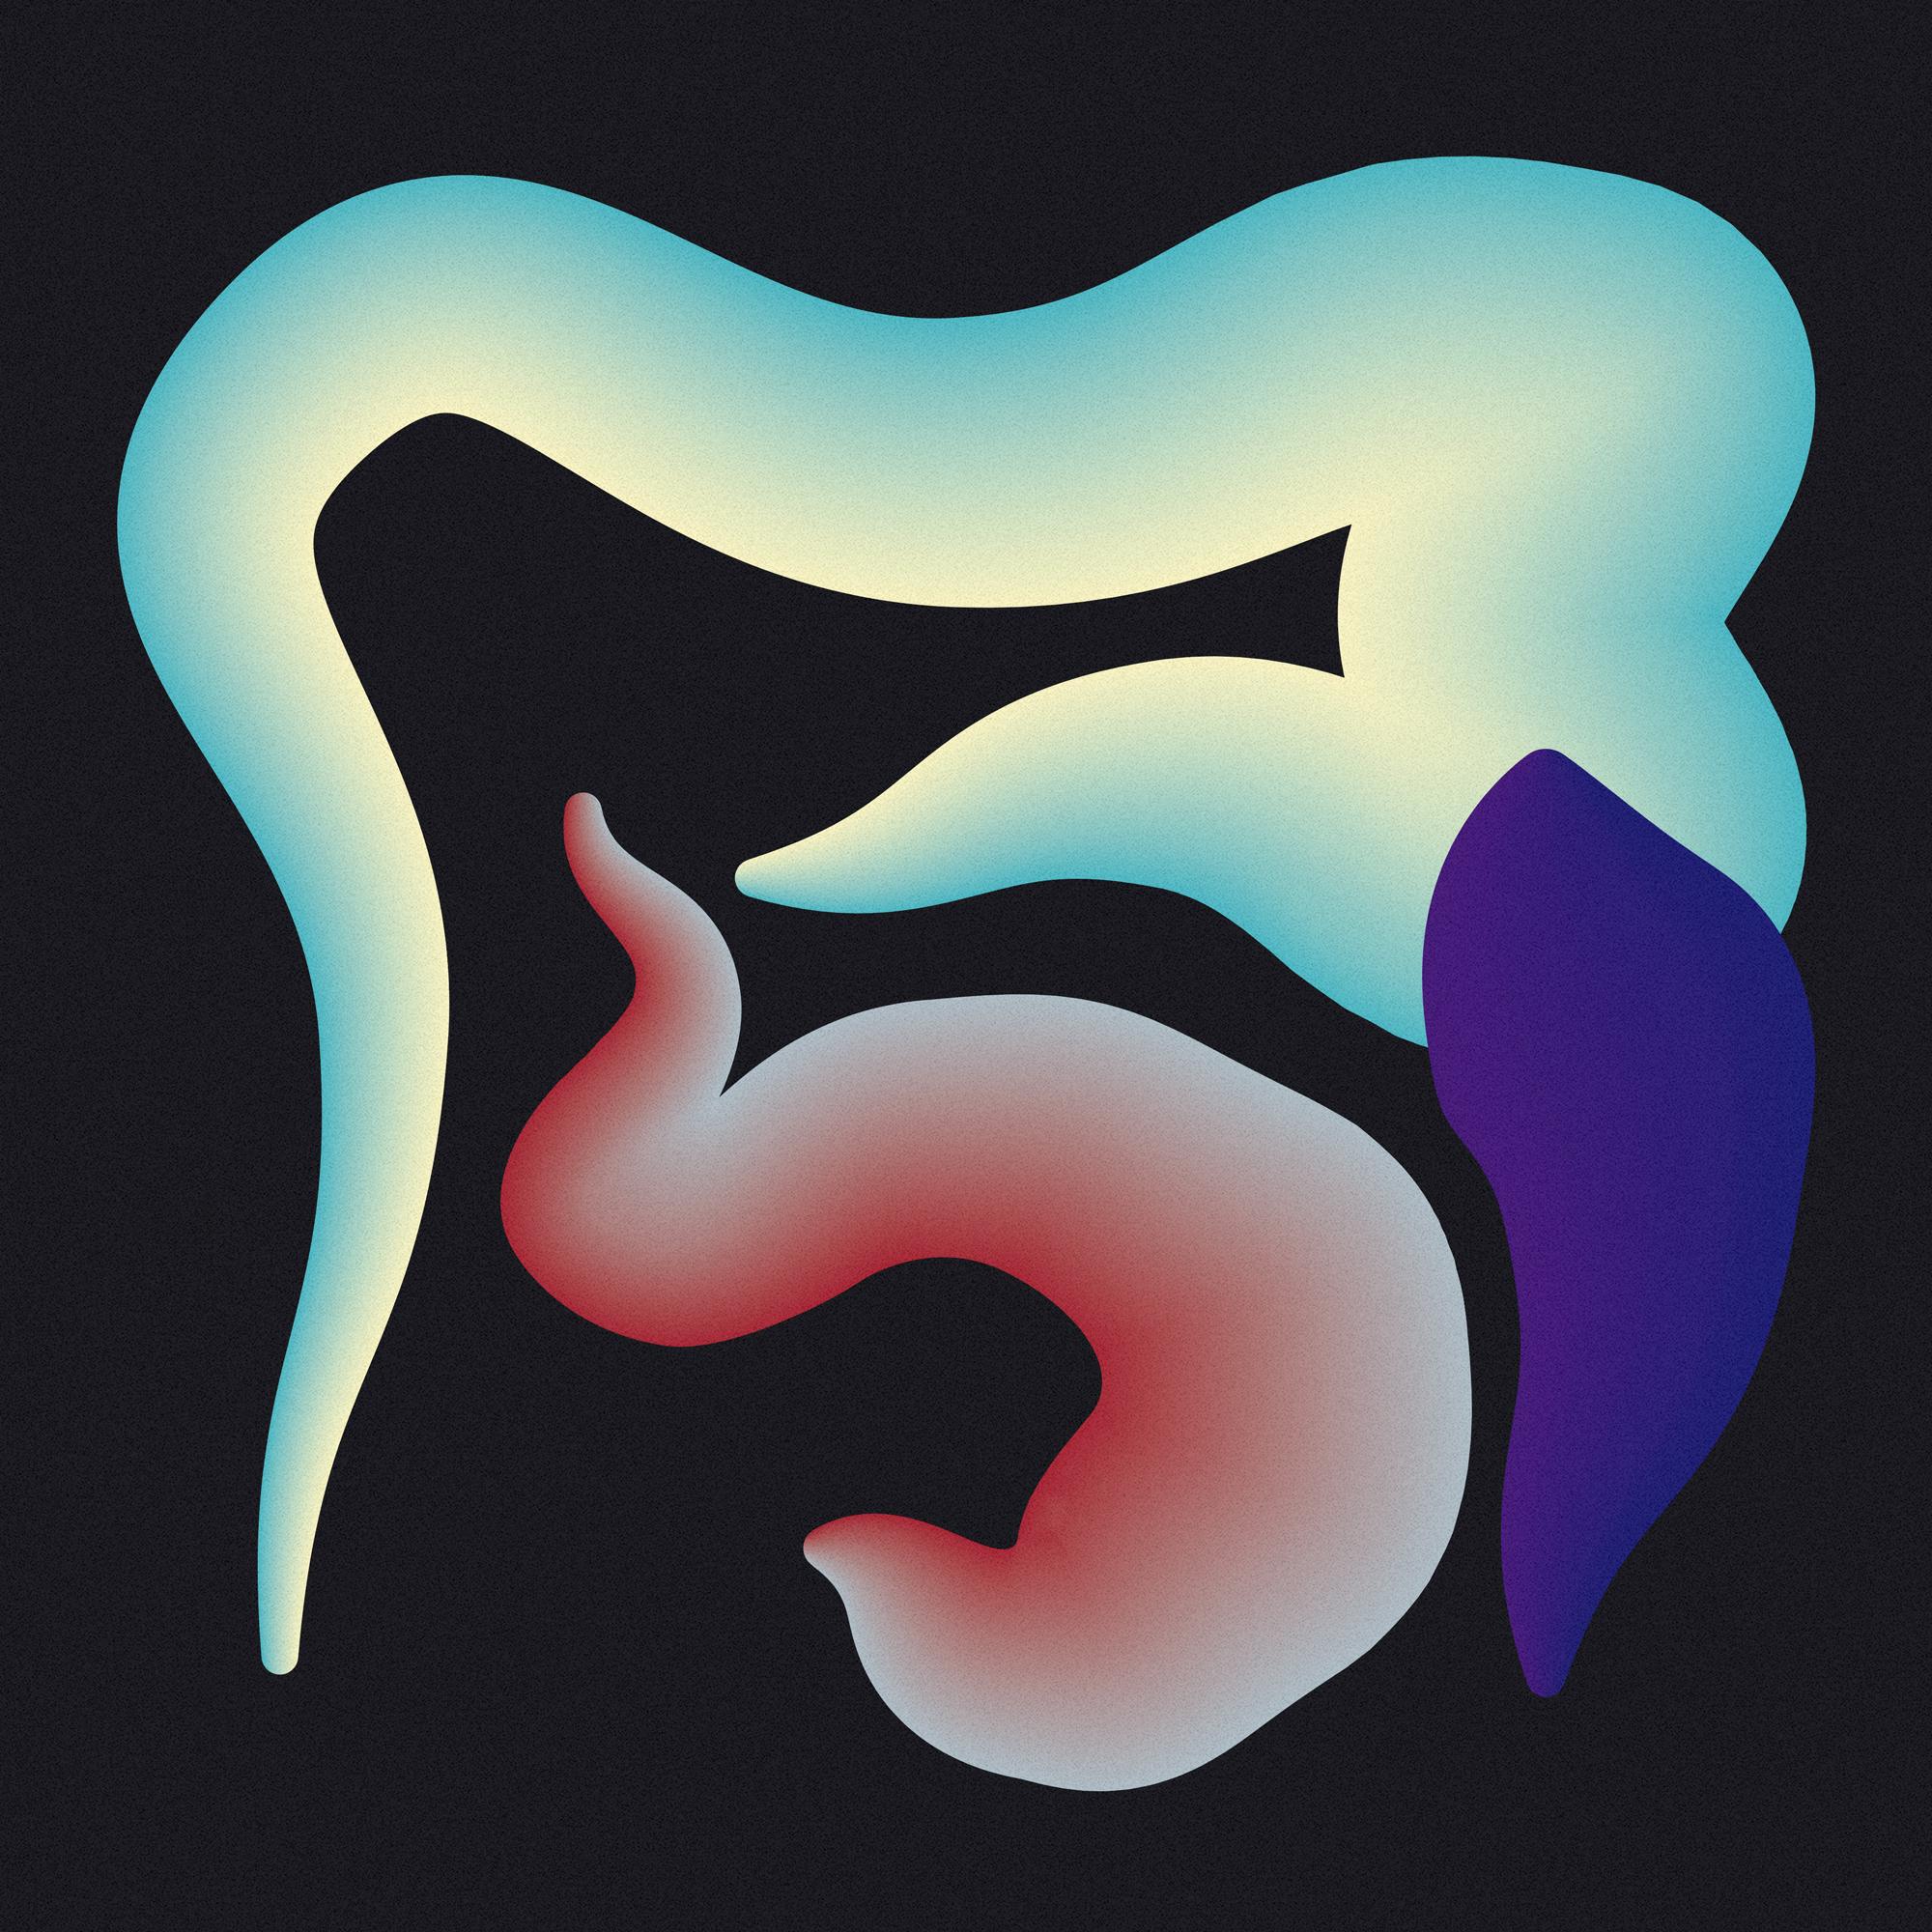 Shape Study designed by Tobias Heumann